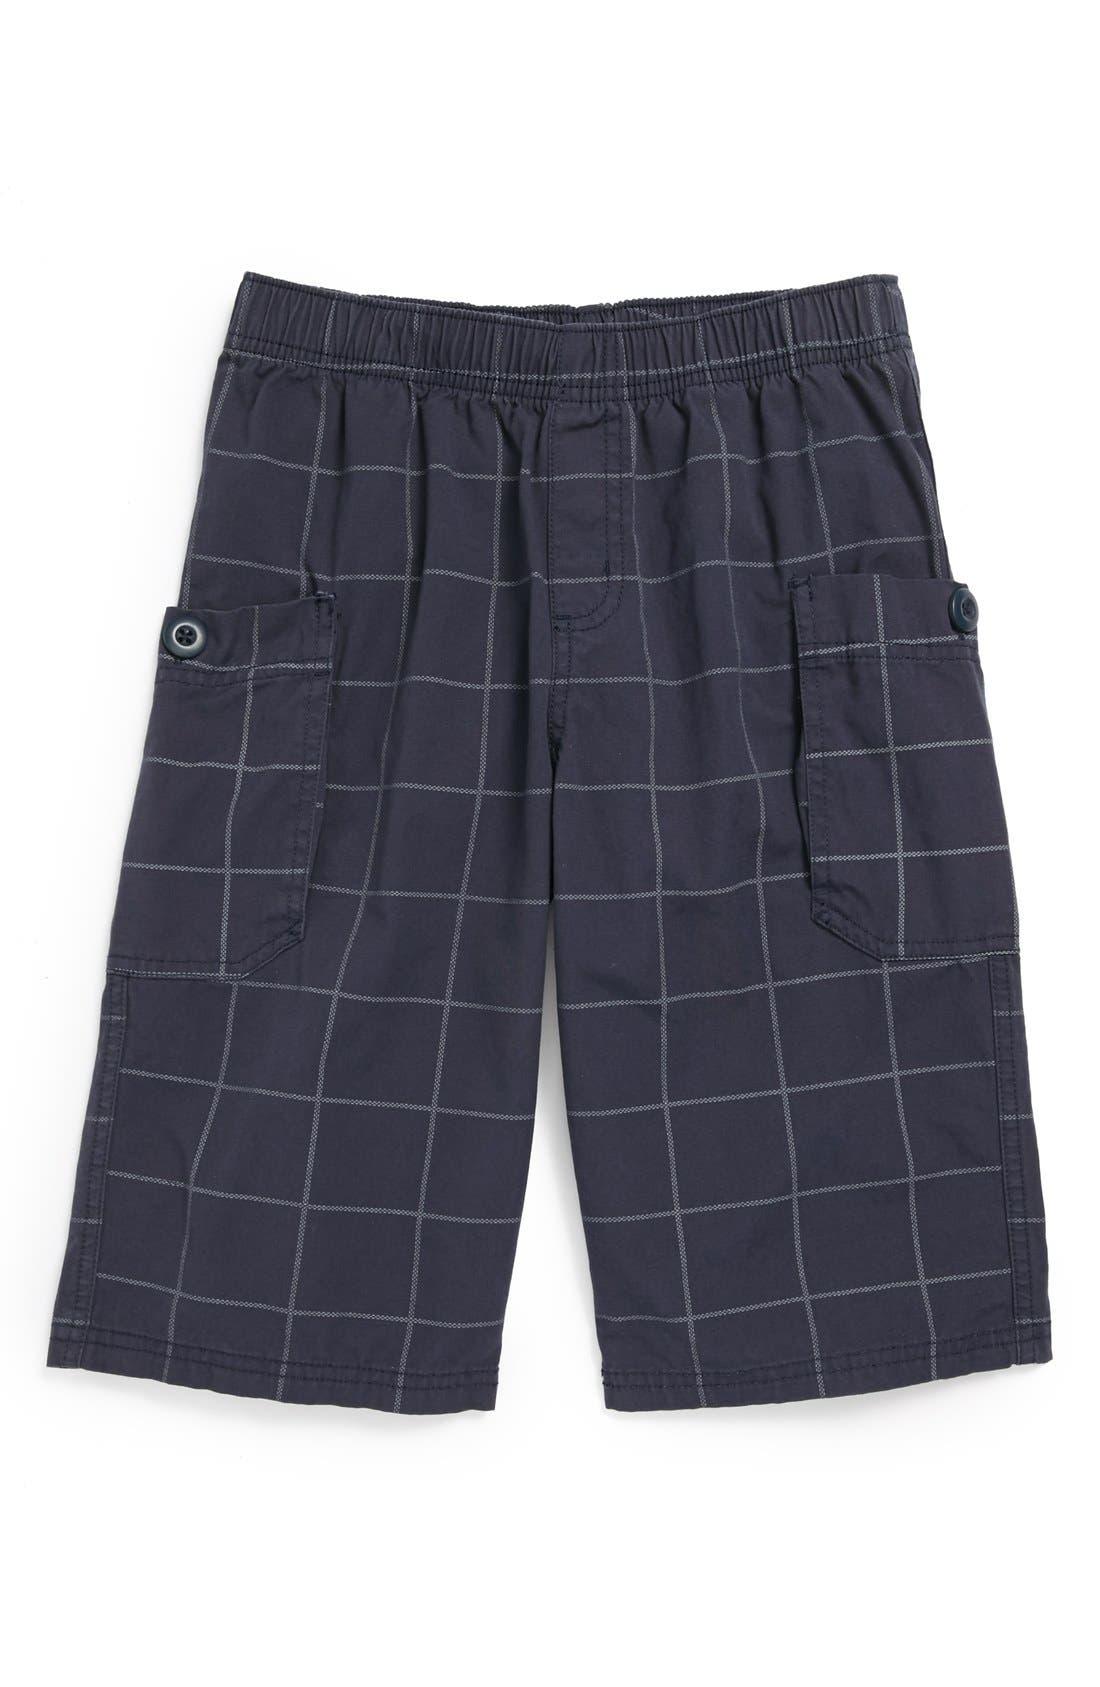 Main Image - Tea Collection 'Bafana' Plaid Shorts (Little Boys & Big Boys)